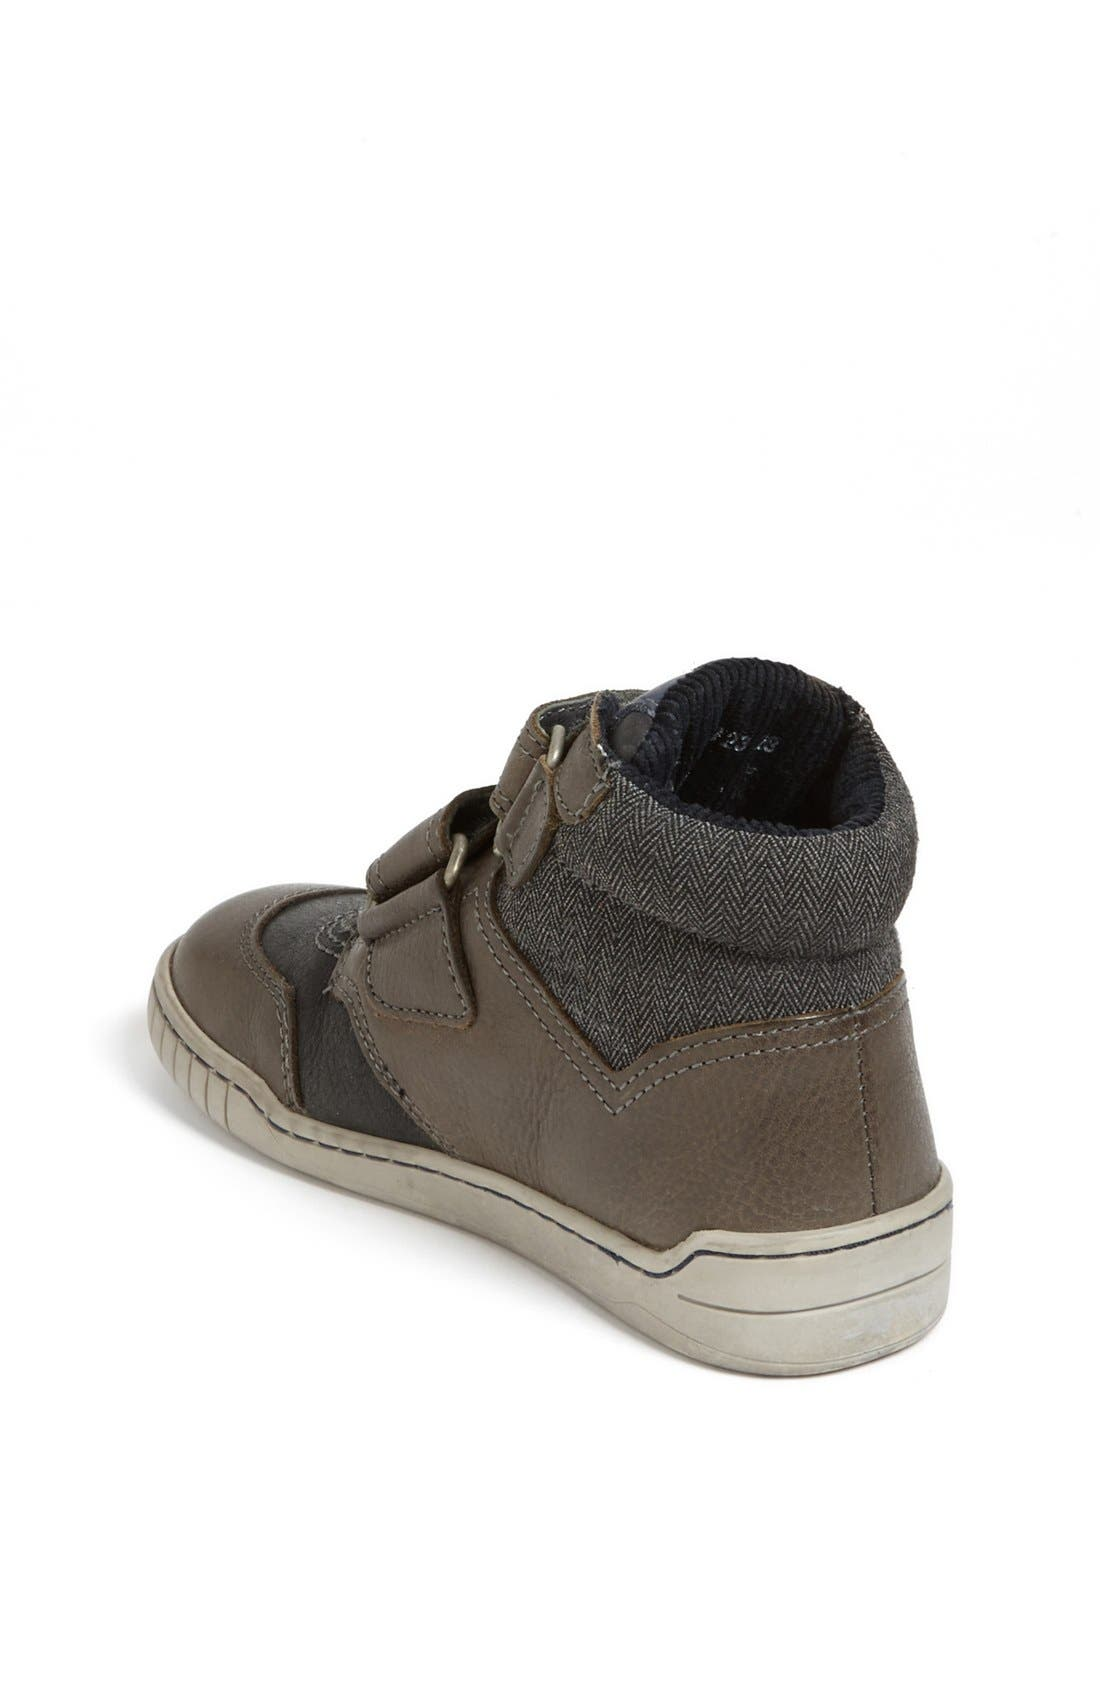 Alternate Image 2  - Kickers 'Windsor 4' Sneaker (Toddler & Little Kid)